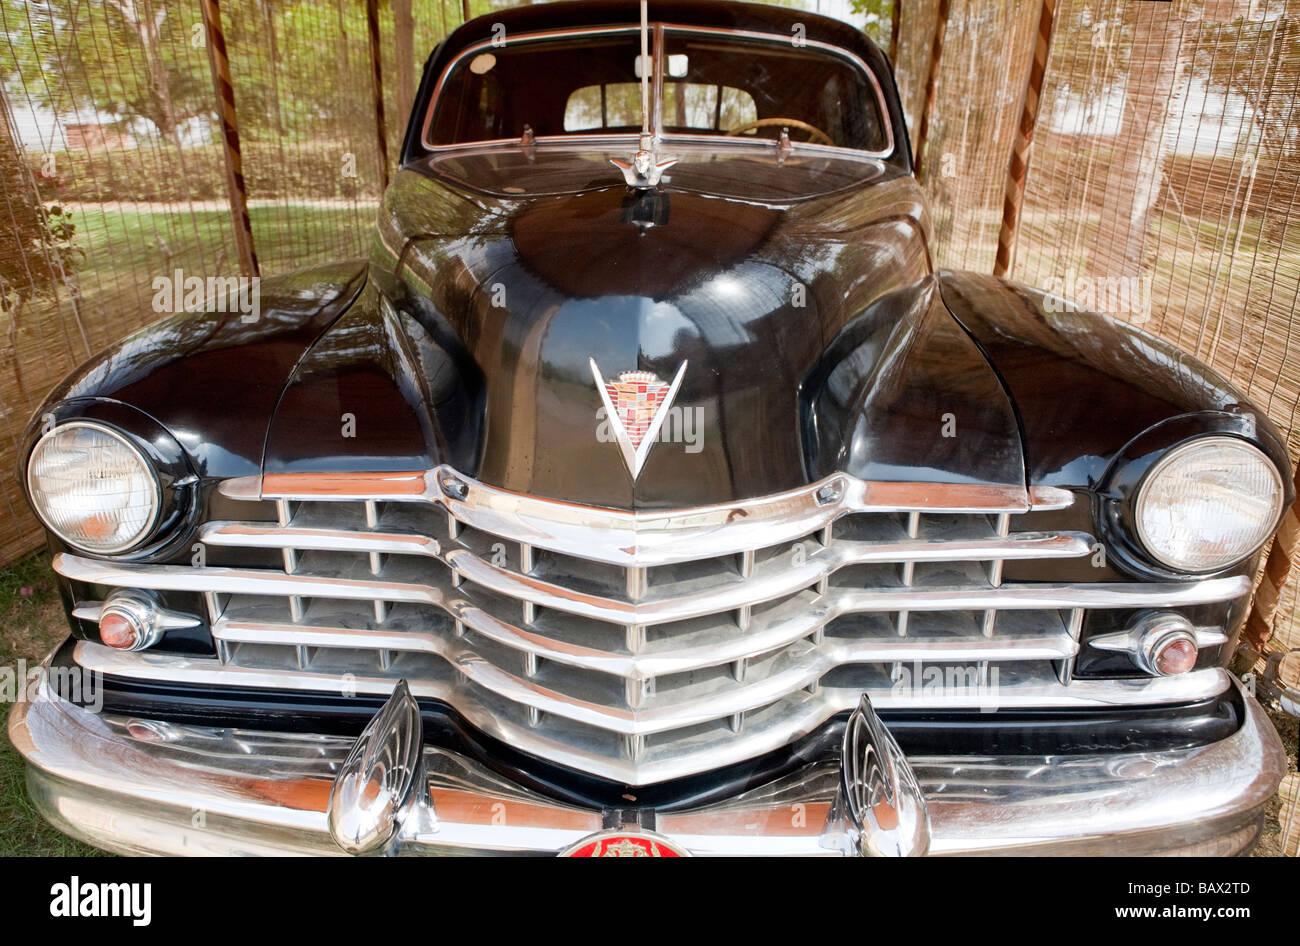 47 Cadillac Fleetwood 60 Special Sedan Classic American Car Umaid